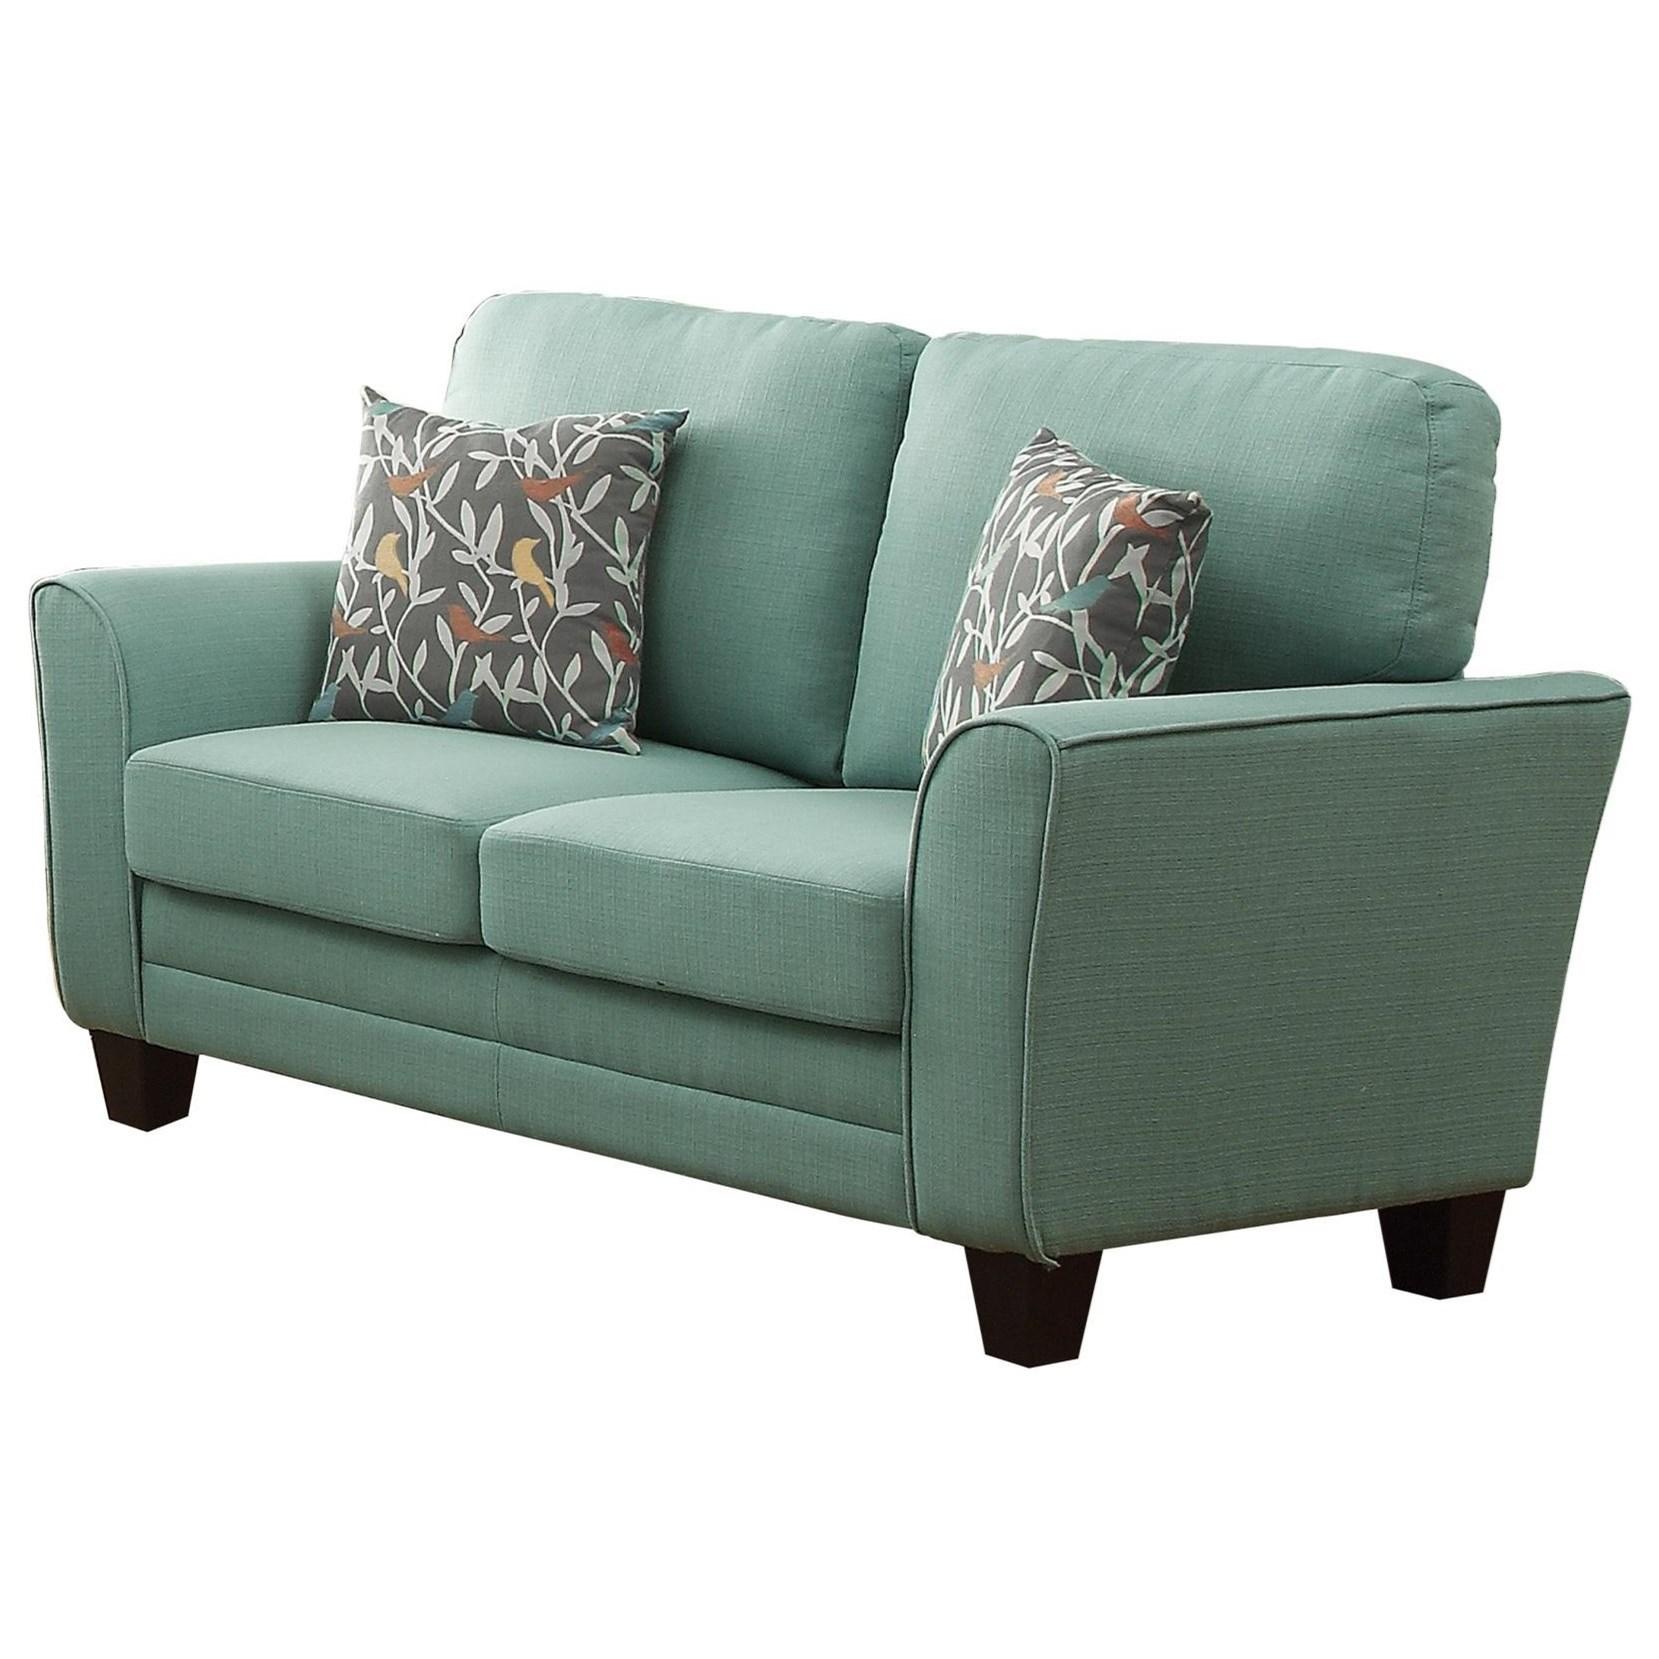 Adair Loveseat by Homelegance at Value City Furniture